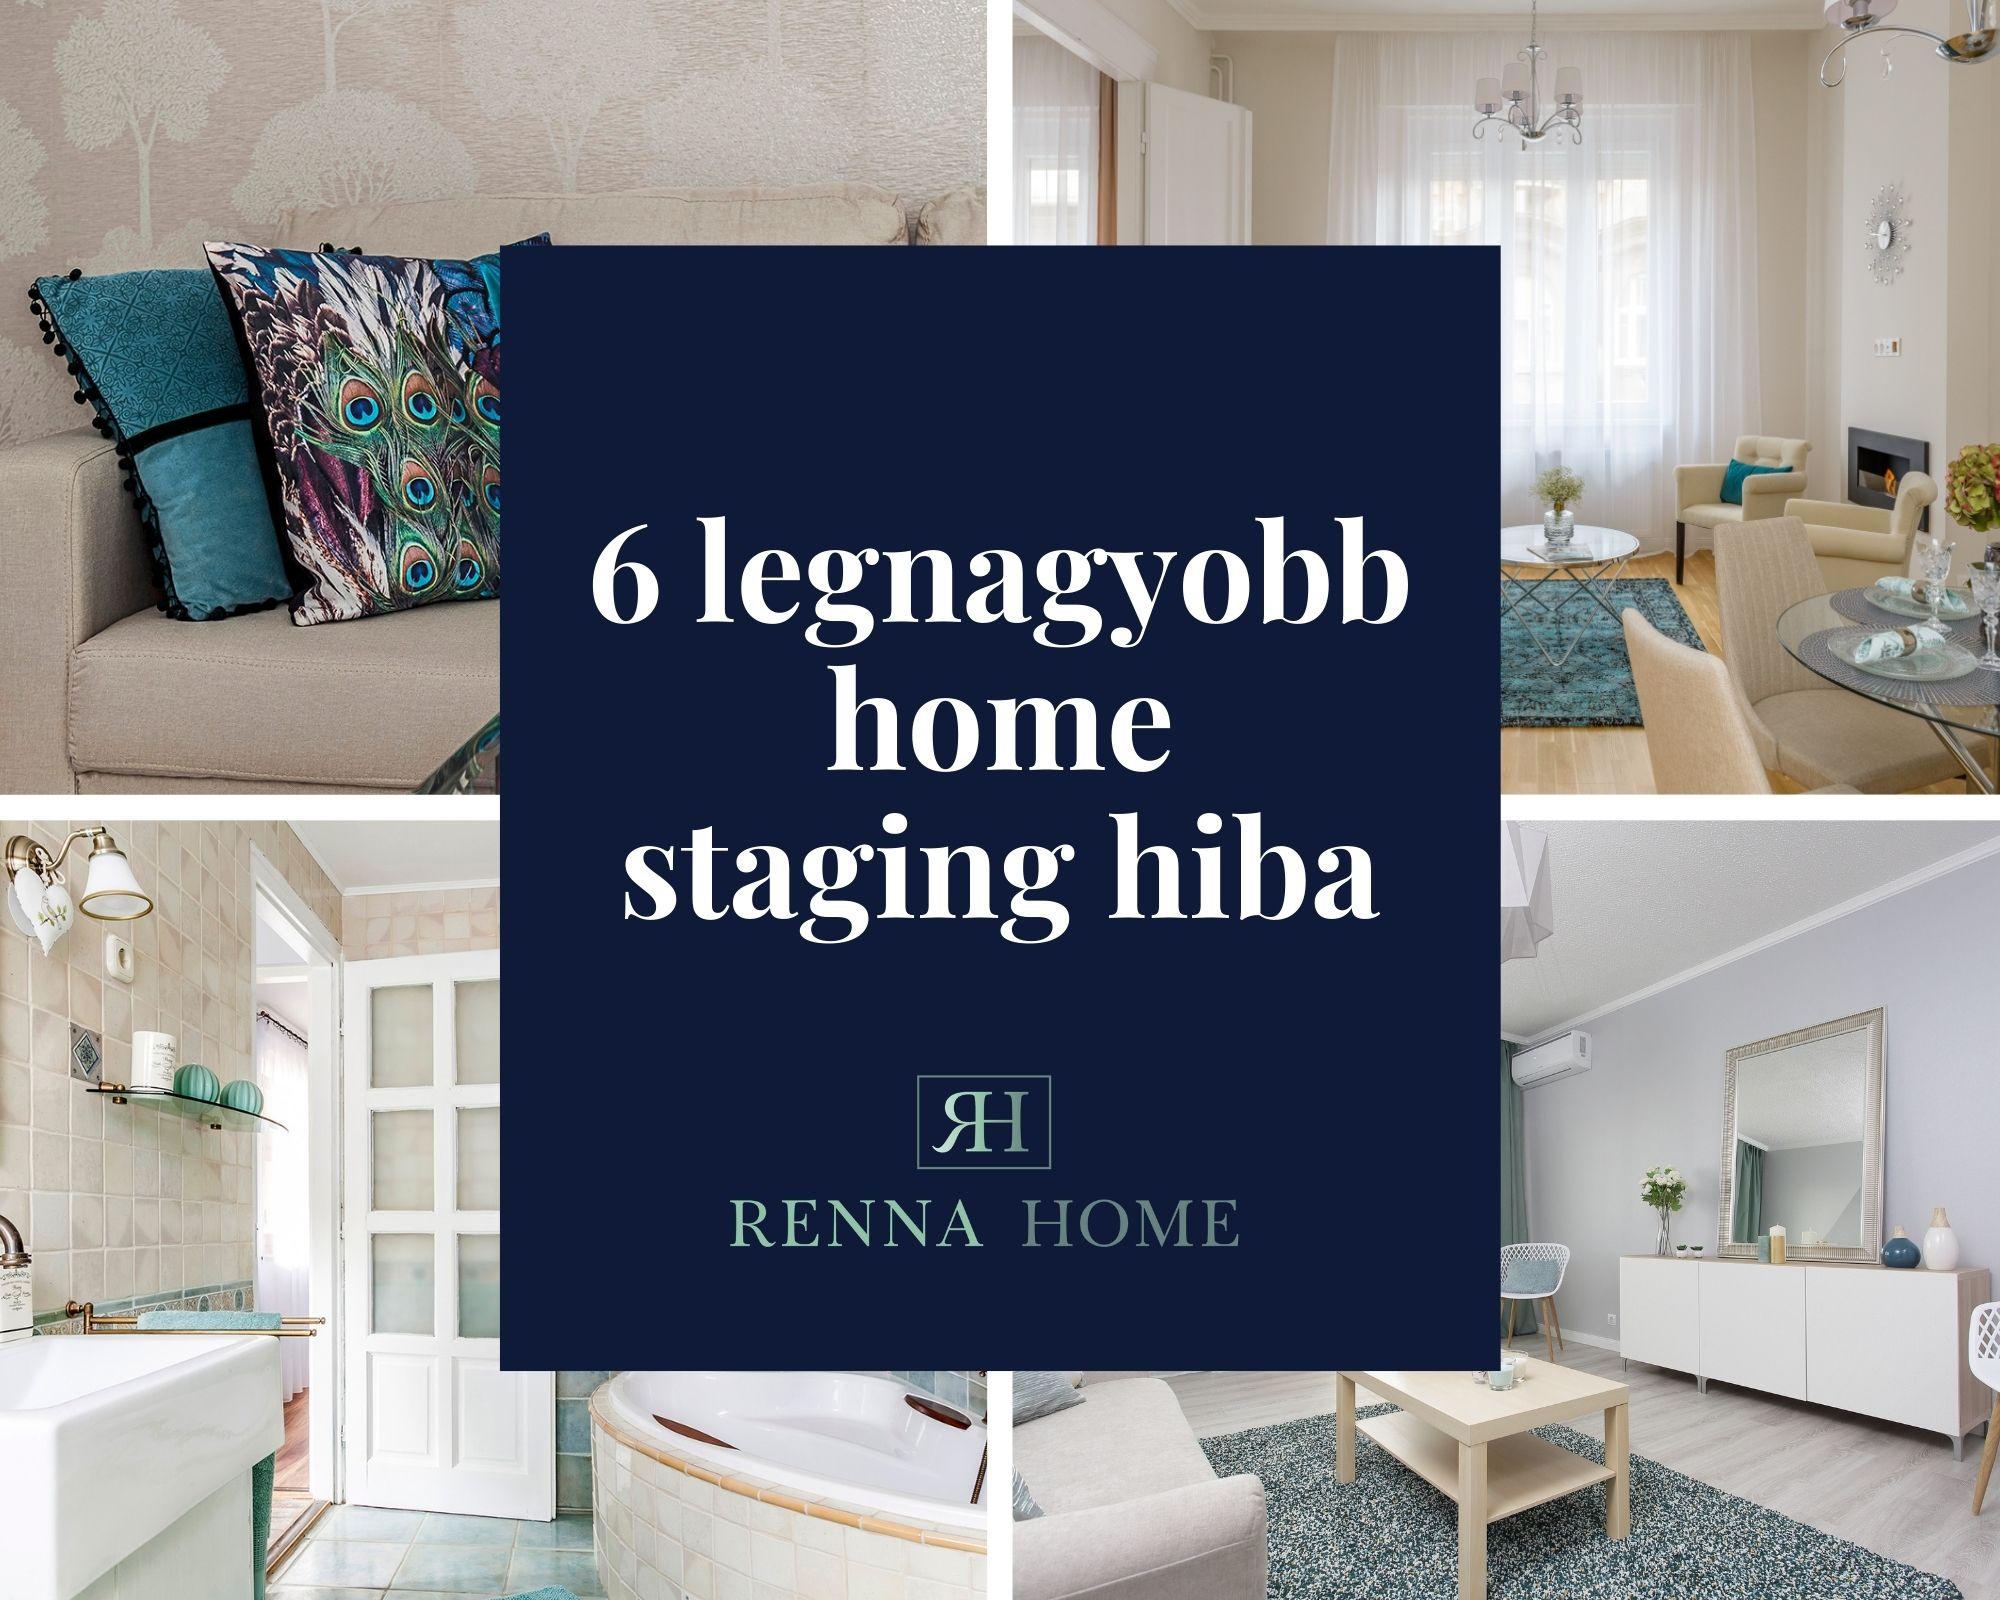 6 legnagyobb home staging hiba